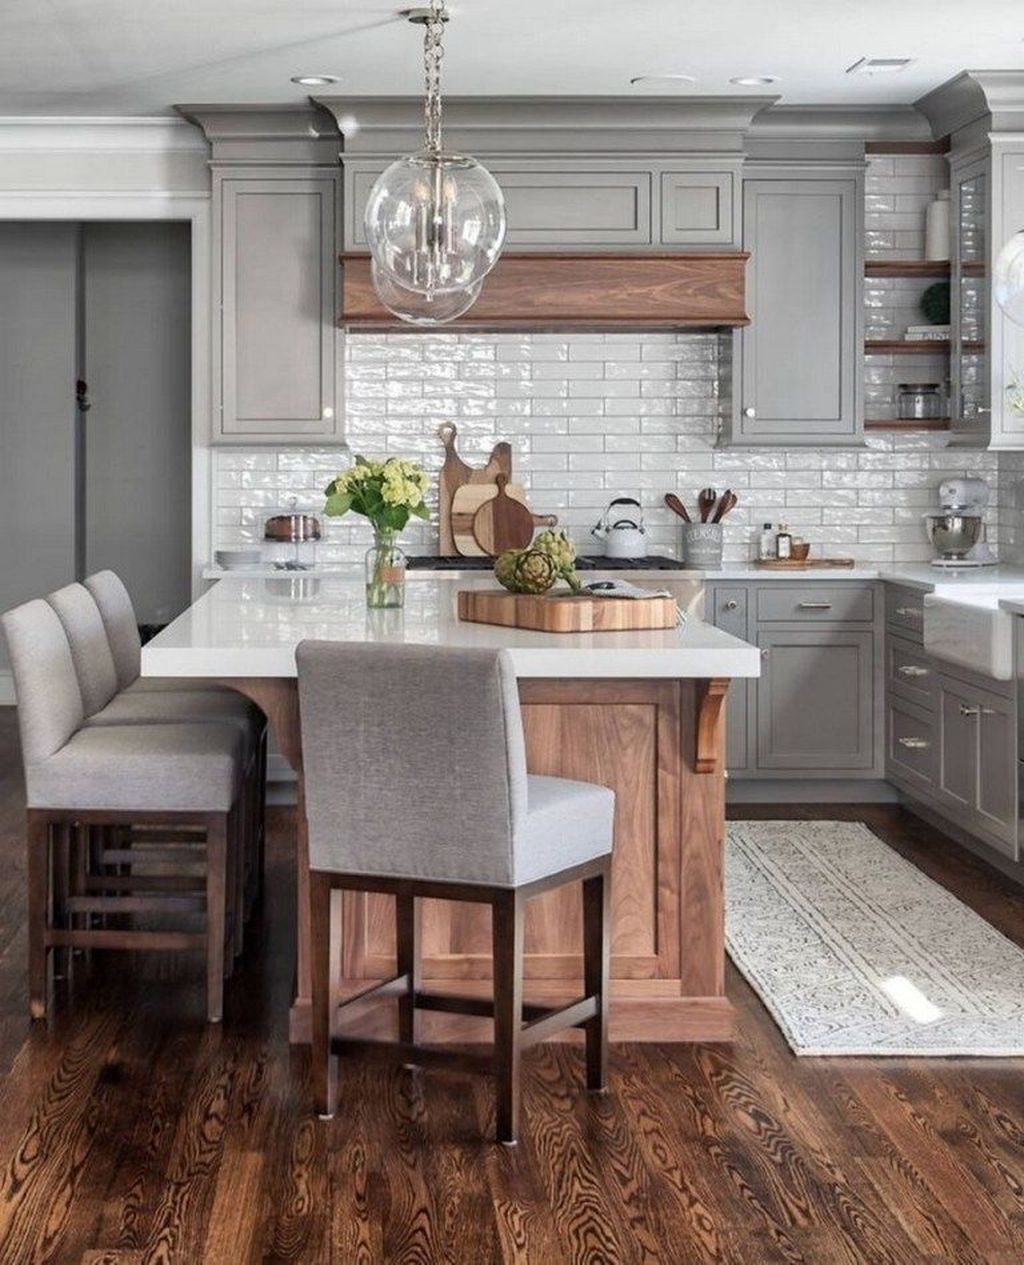 Colorful Home Decor Amazing Modern Farmhouse Kitchen Design Ideas That You Should Copy There Is No In 2020 Farmhouse Kitchen Design Home Decor Kitchen Kitchen Design